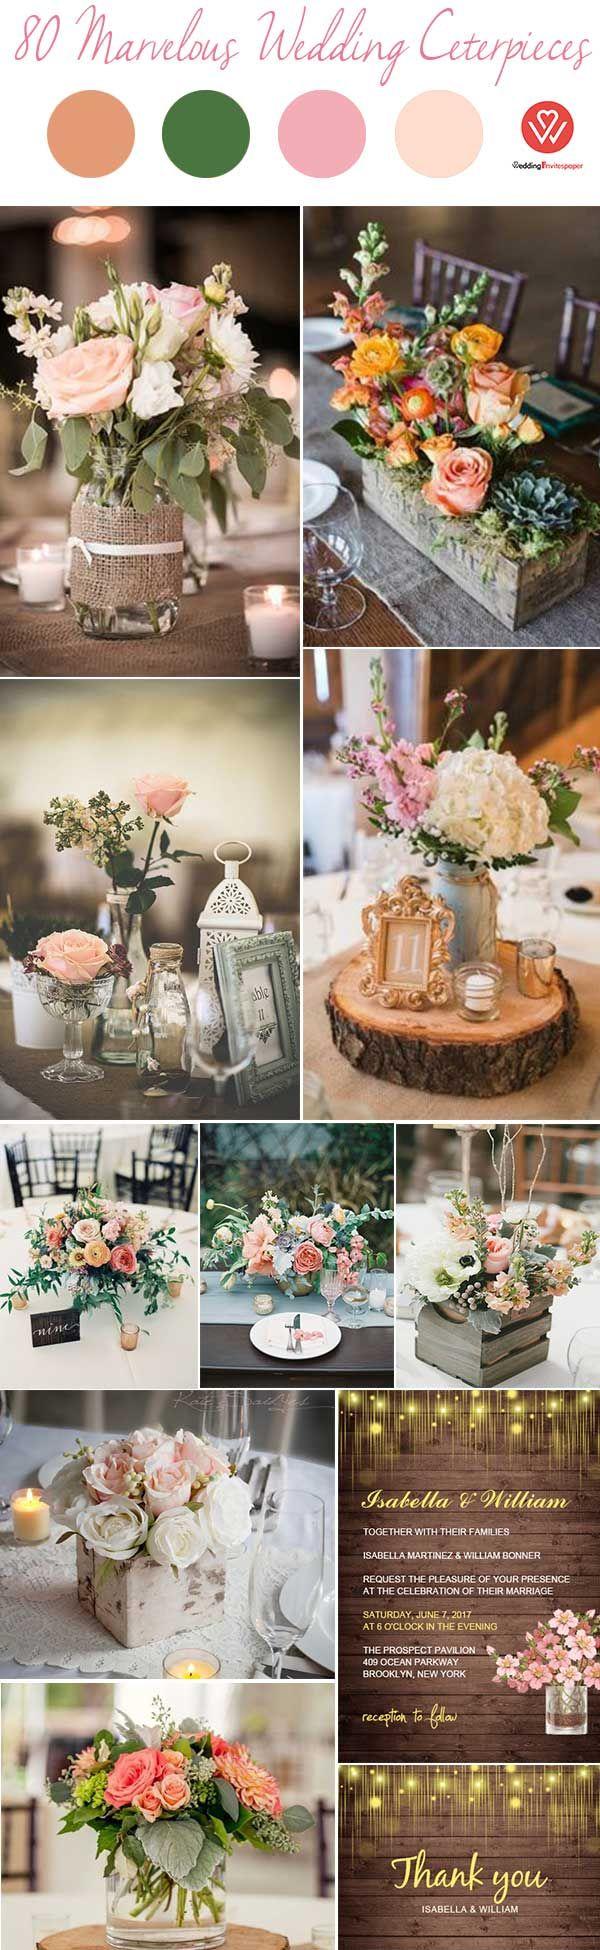 80 MARVELOUS DIY RUSTIC & CHEAP WEDDING CENTERPIECE IDEAS - Wedding Invites Paper rustic fall wedding centerpiece/ vintage wedding invitations/ shabby chic fall wedding decorations